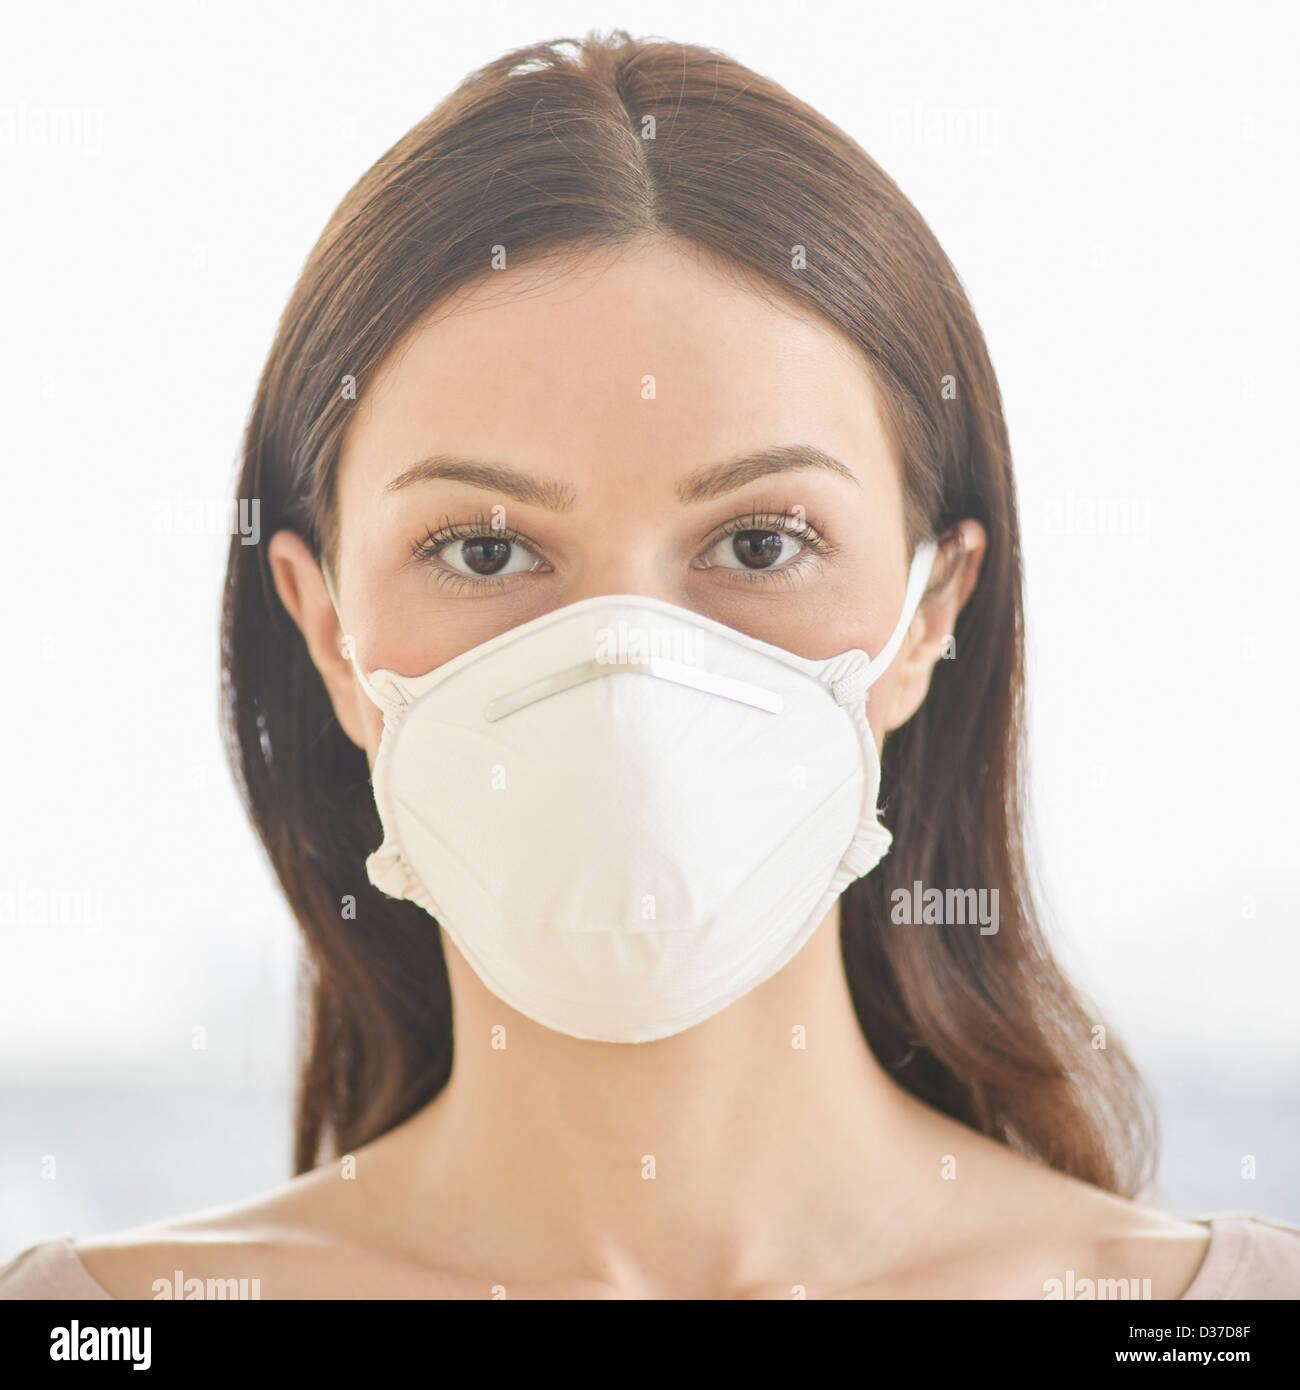 Of Mask Wearing Flu Stock Photo Studio Portrait Woman 53639167